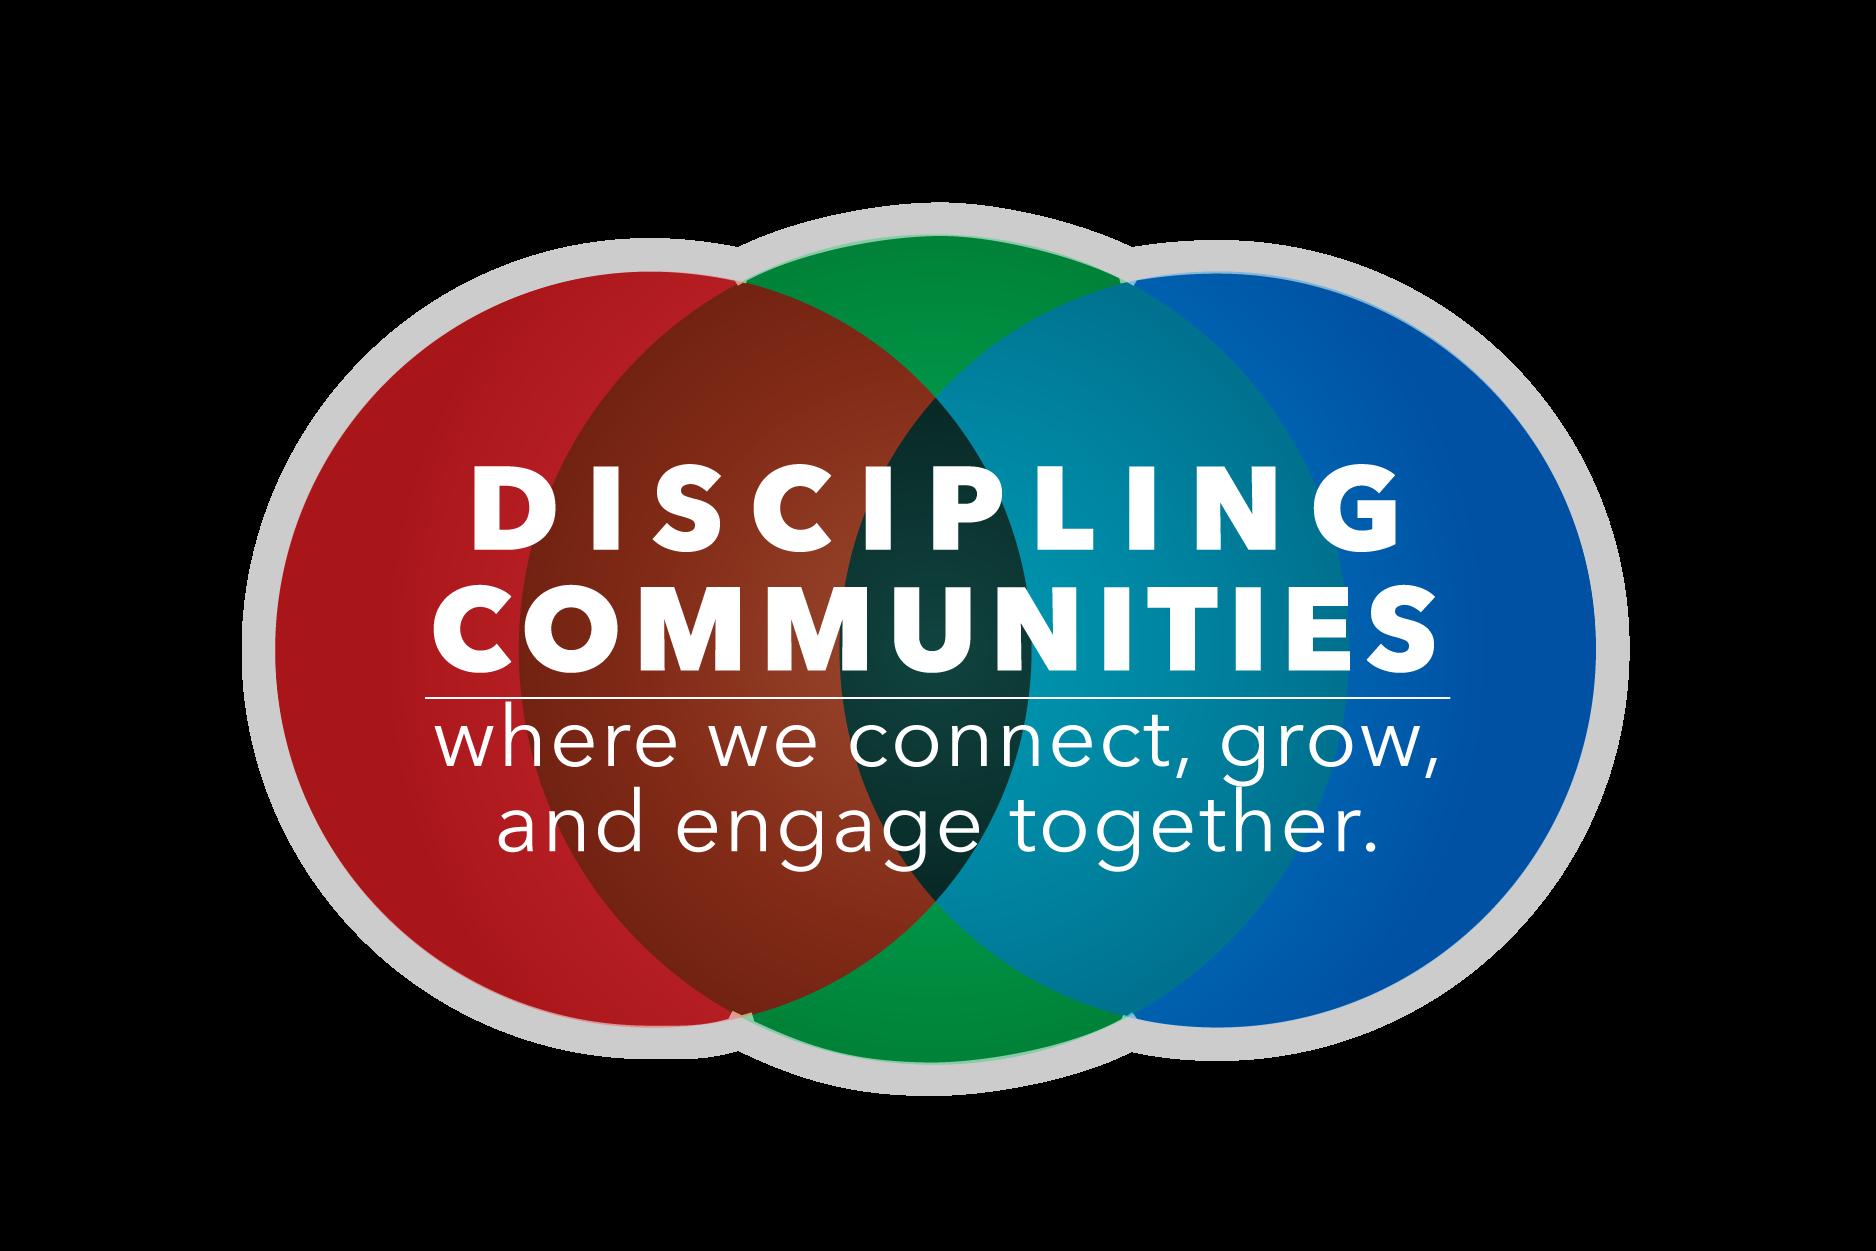 discipling communities logo3-01.png